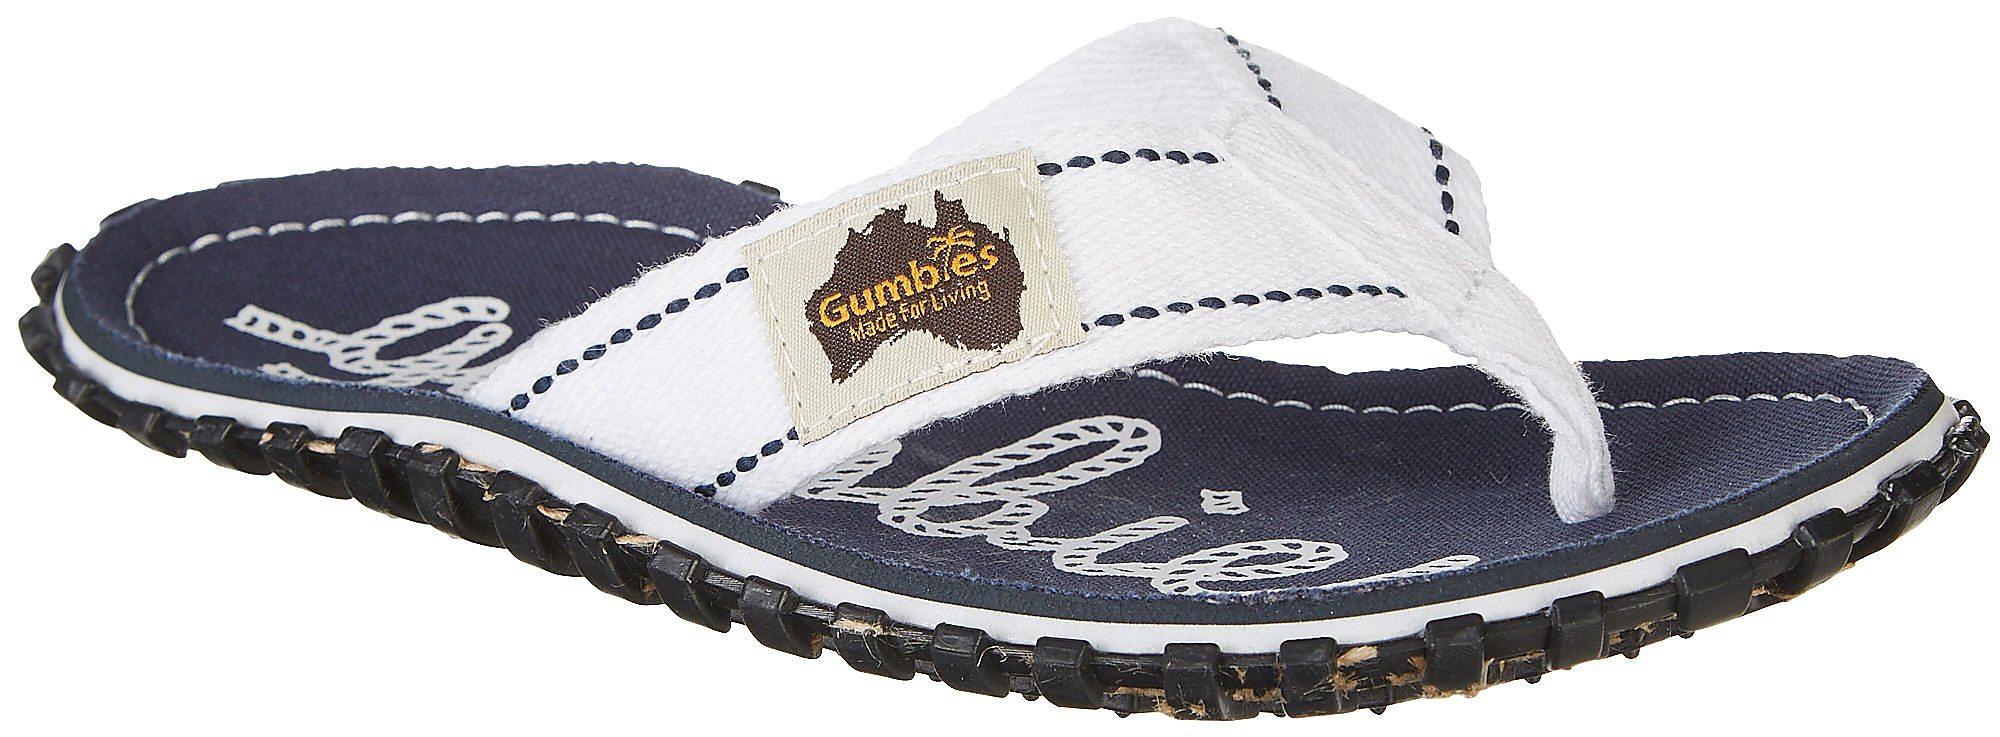 b5a49c57228b Gumbies Womens Islander Flip Flops